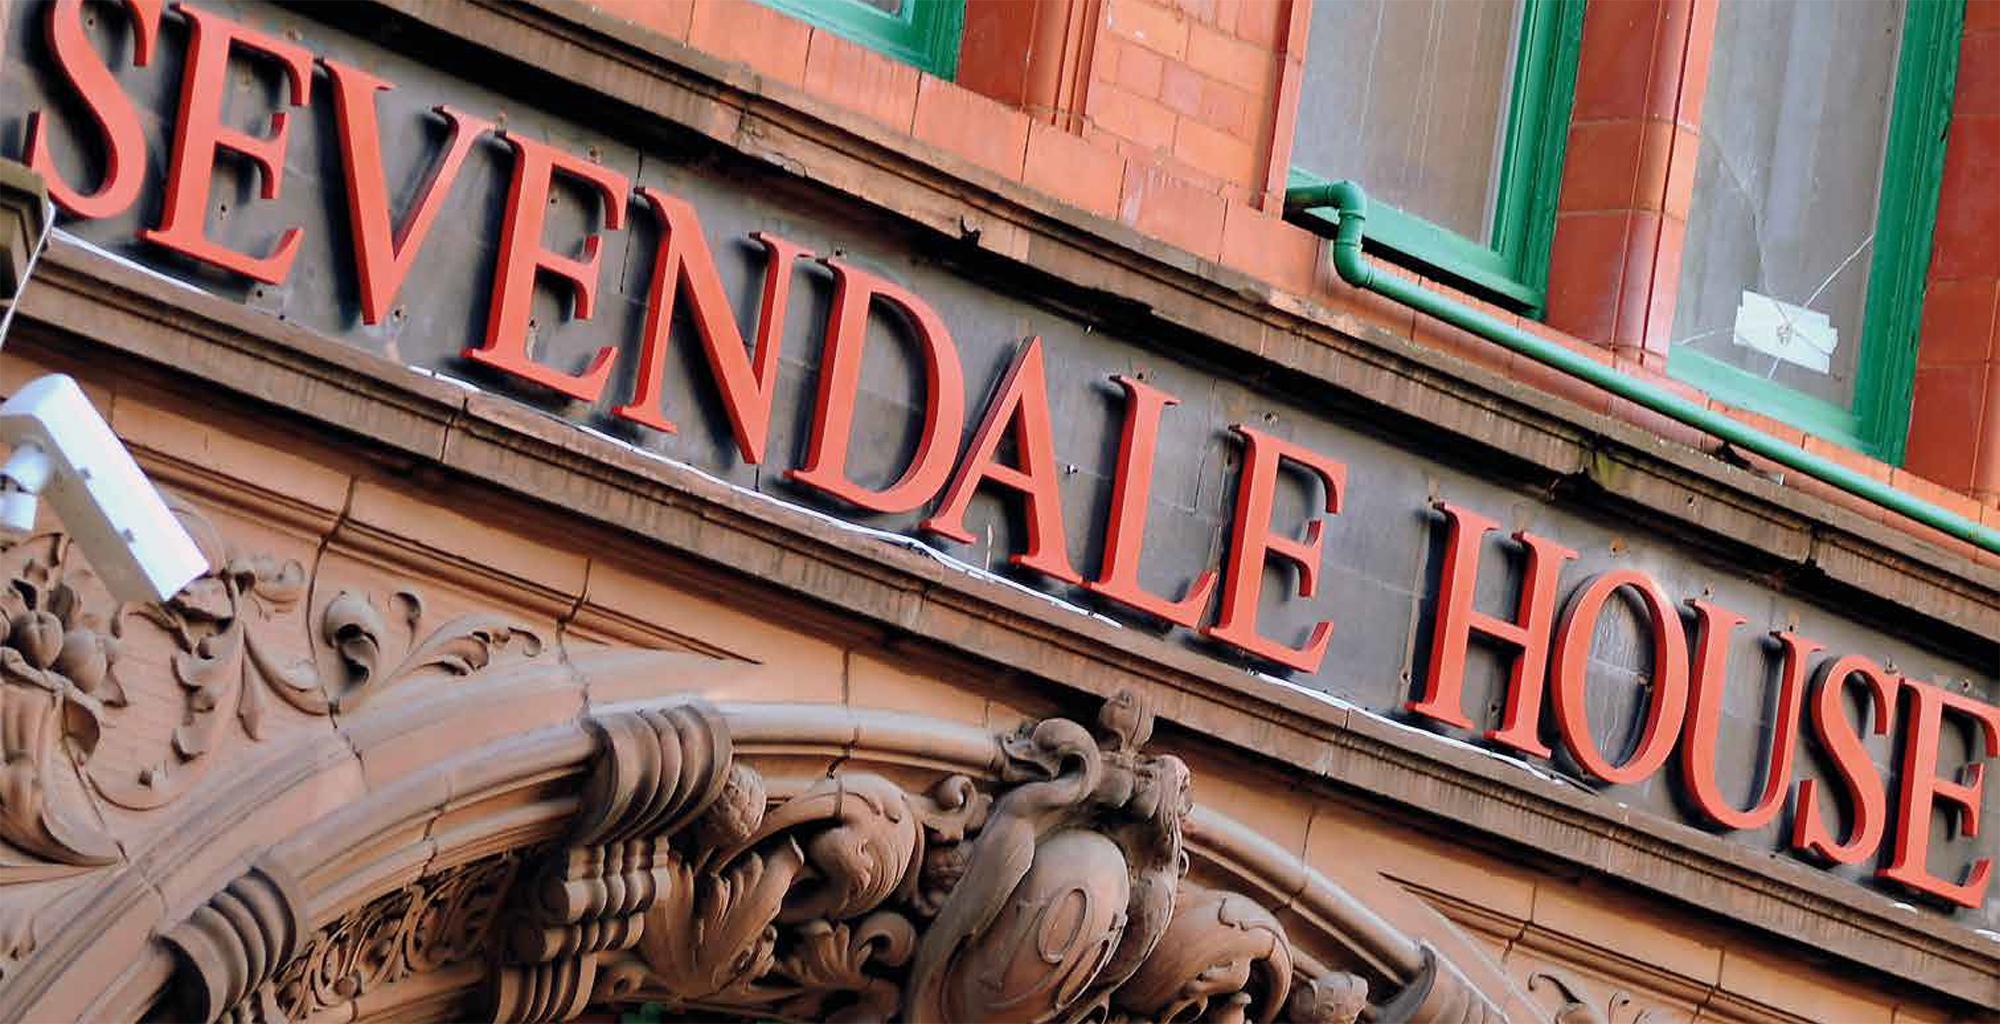 Sevendale House